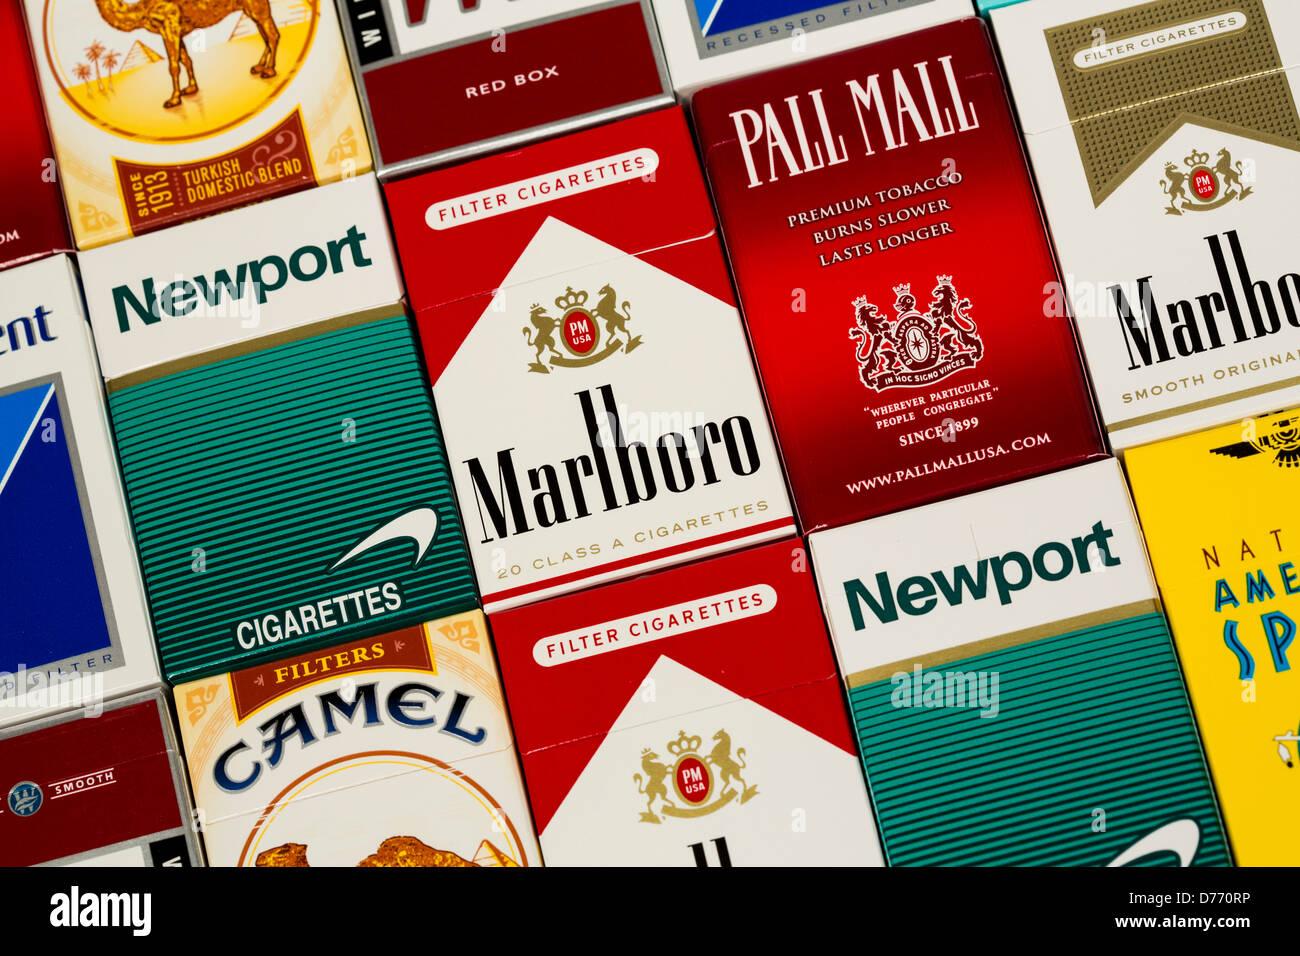 Buy Marlboro cigarette online in bangalore